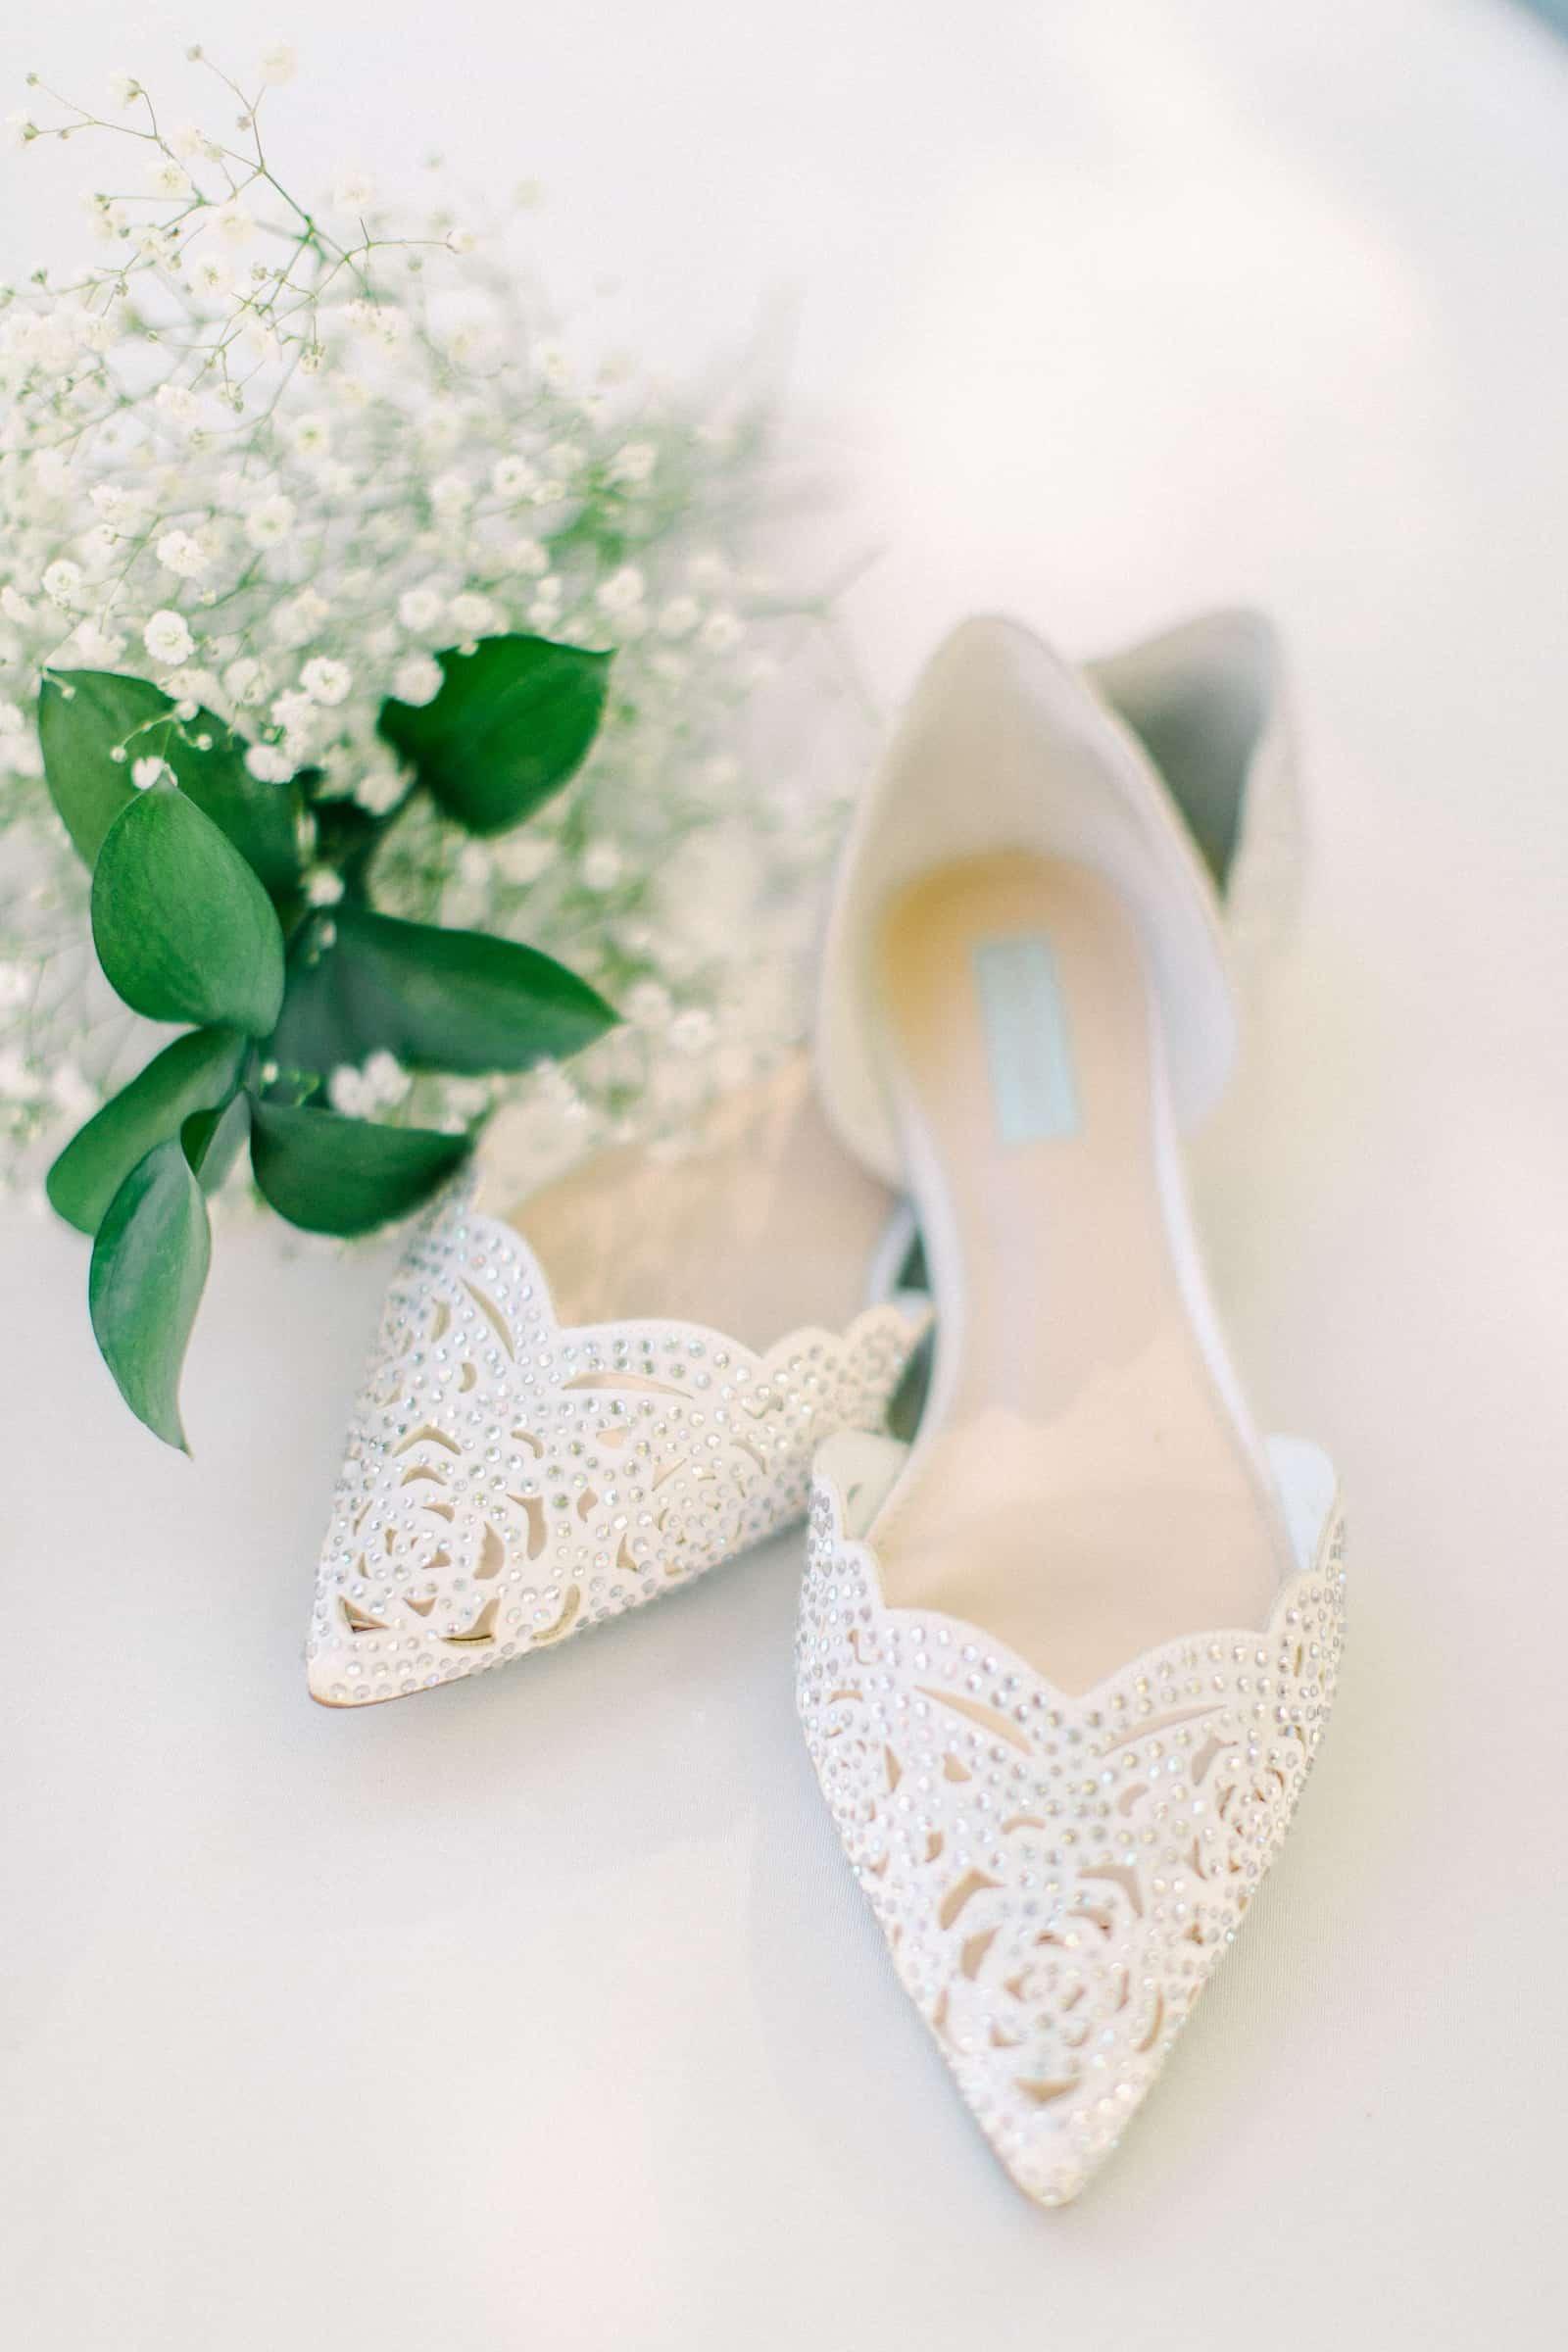 Draper LDS Temple Wedding, Utah wedding photography, summer backyard wedding, bride's shoes